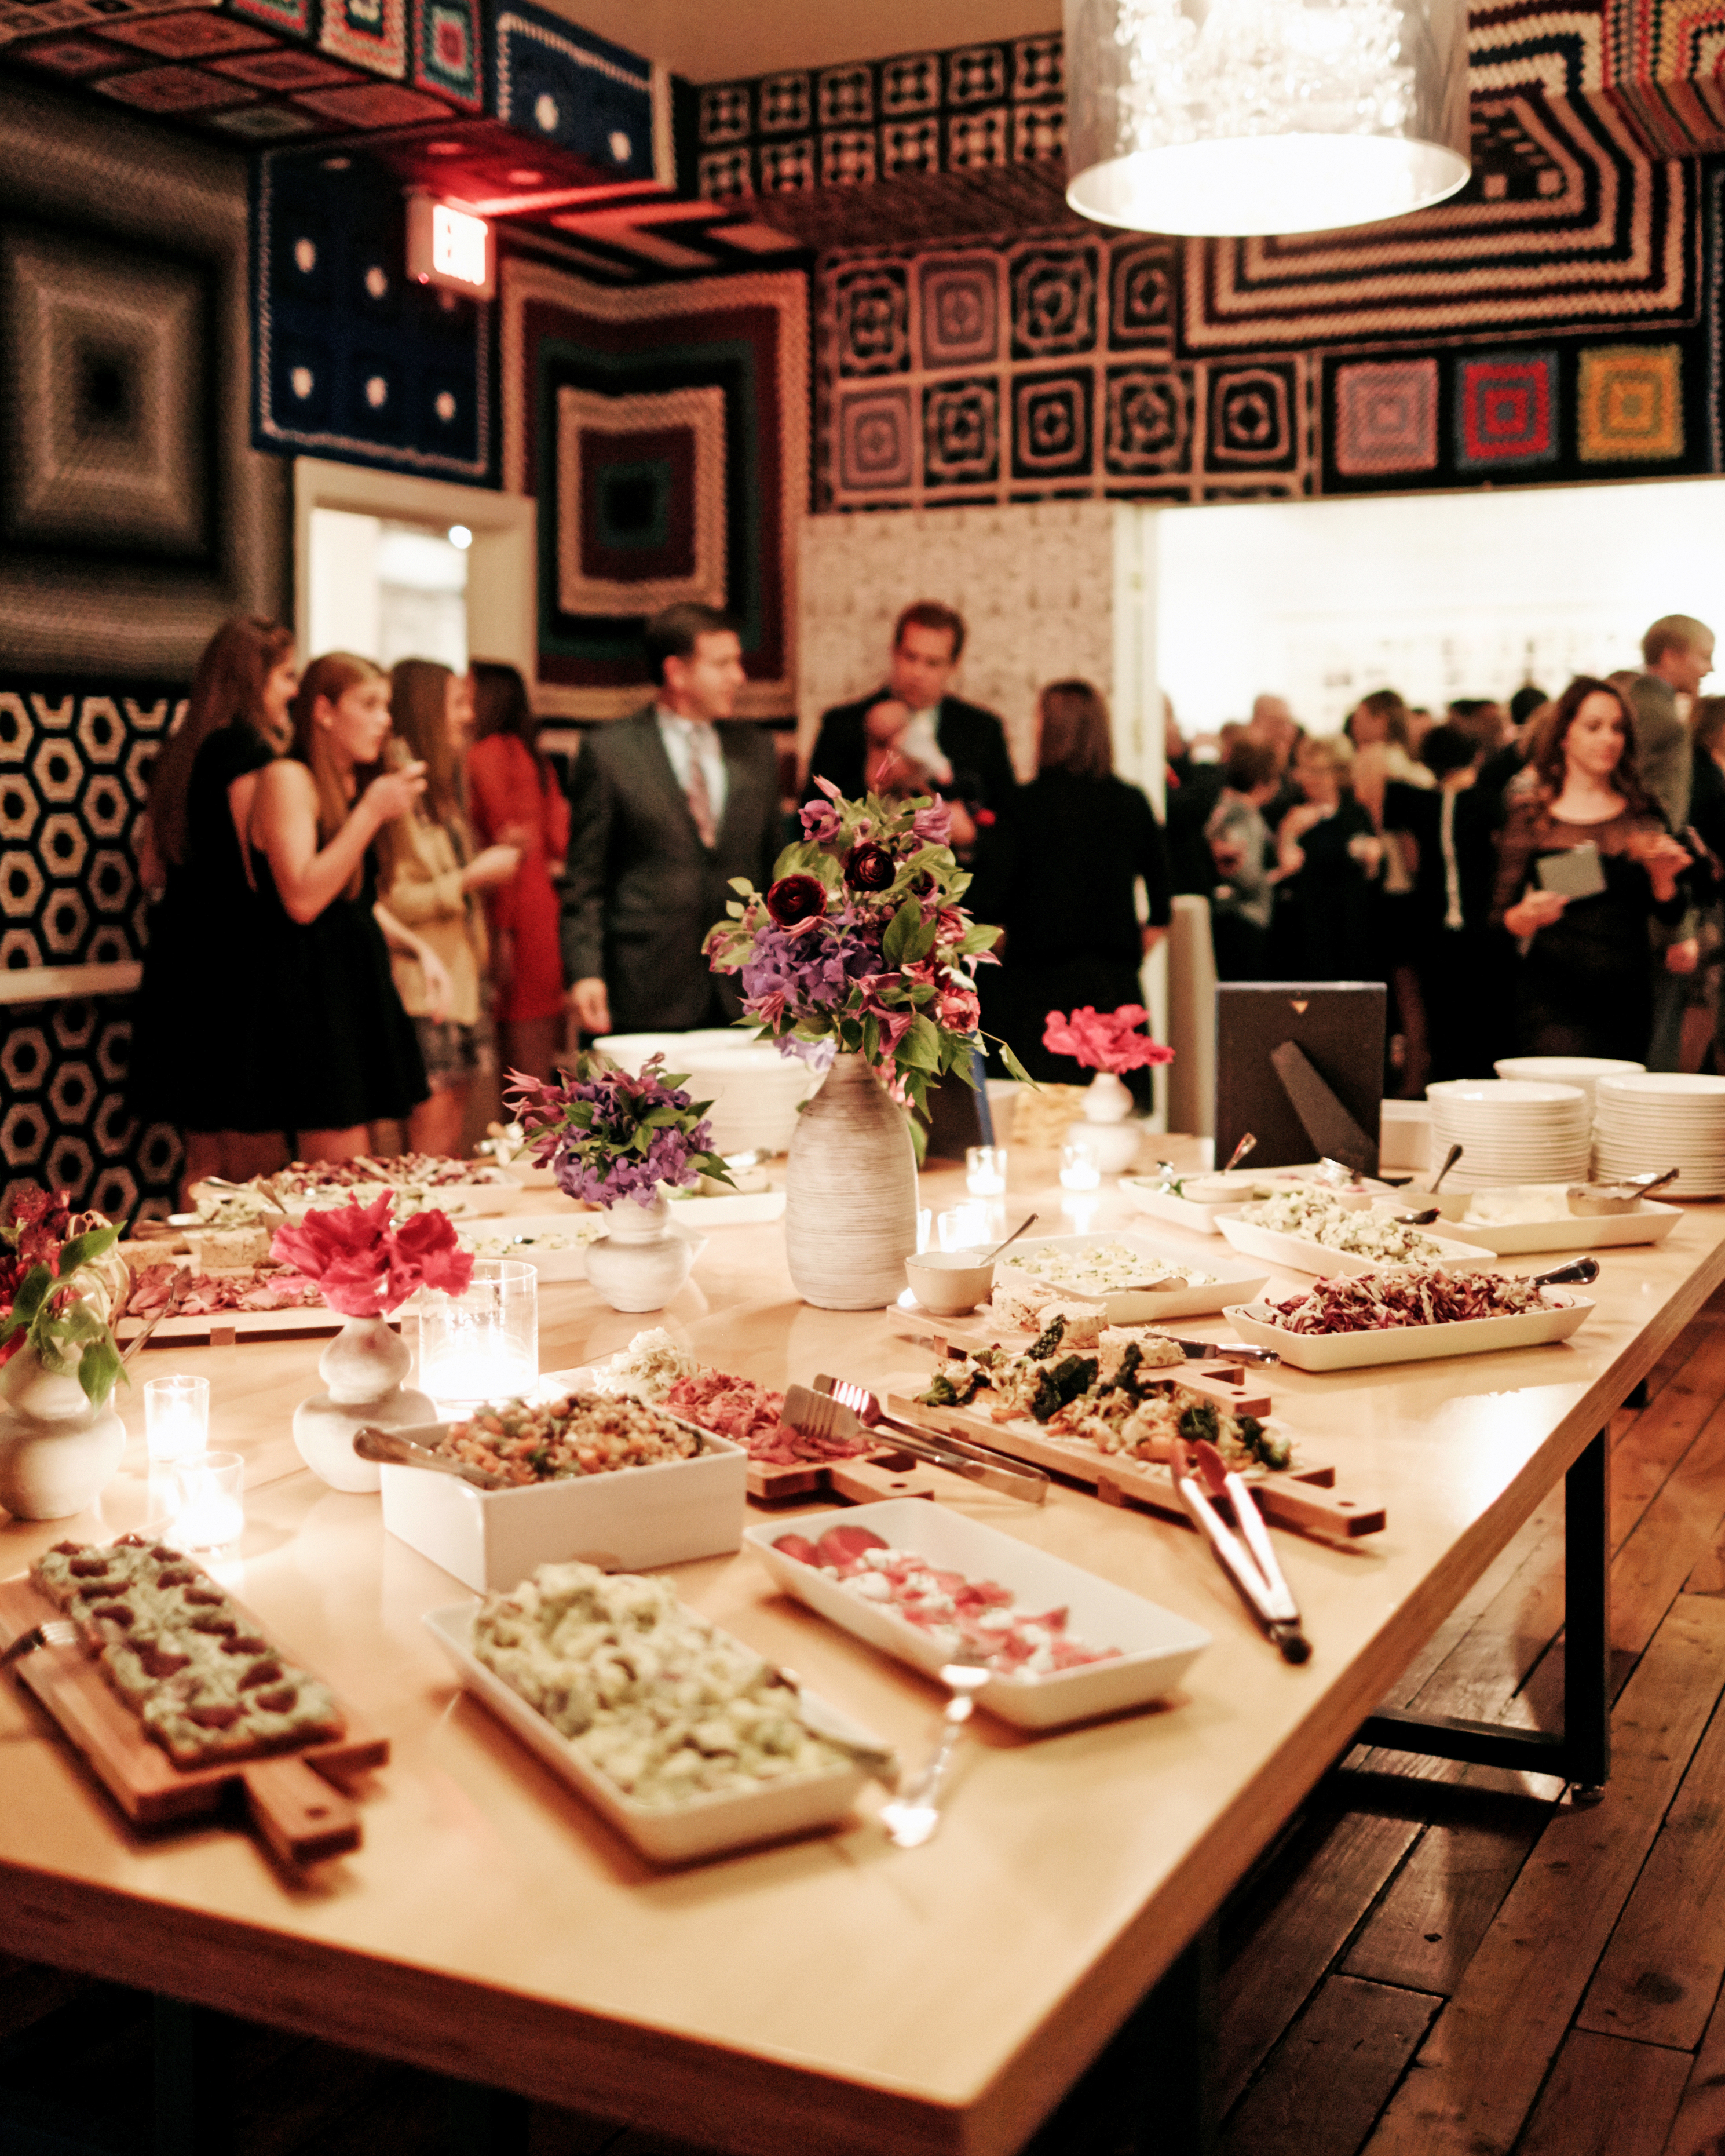 Eco Friendly Wedding Ideas: 18 Ways To Plan An Eco-Friendly Wedding